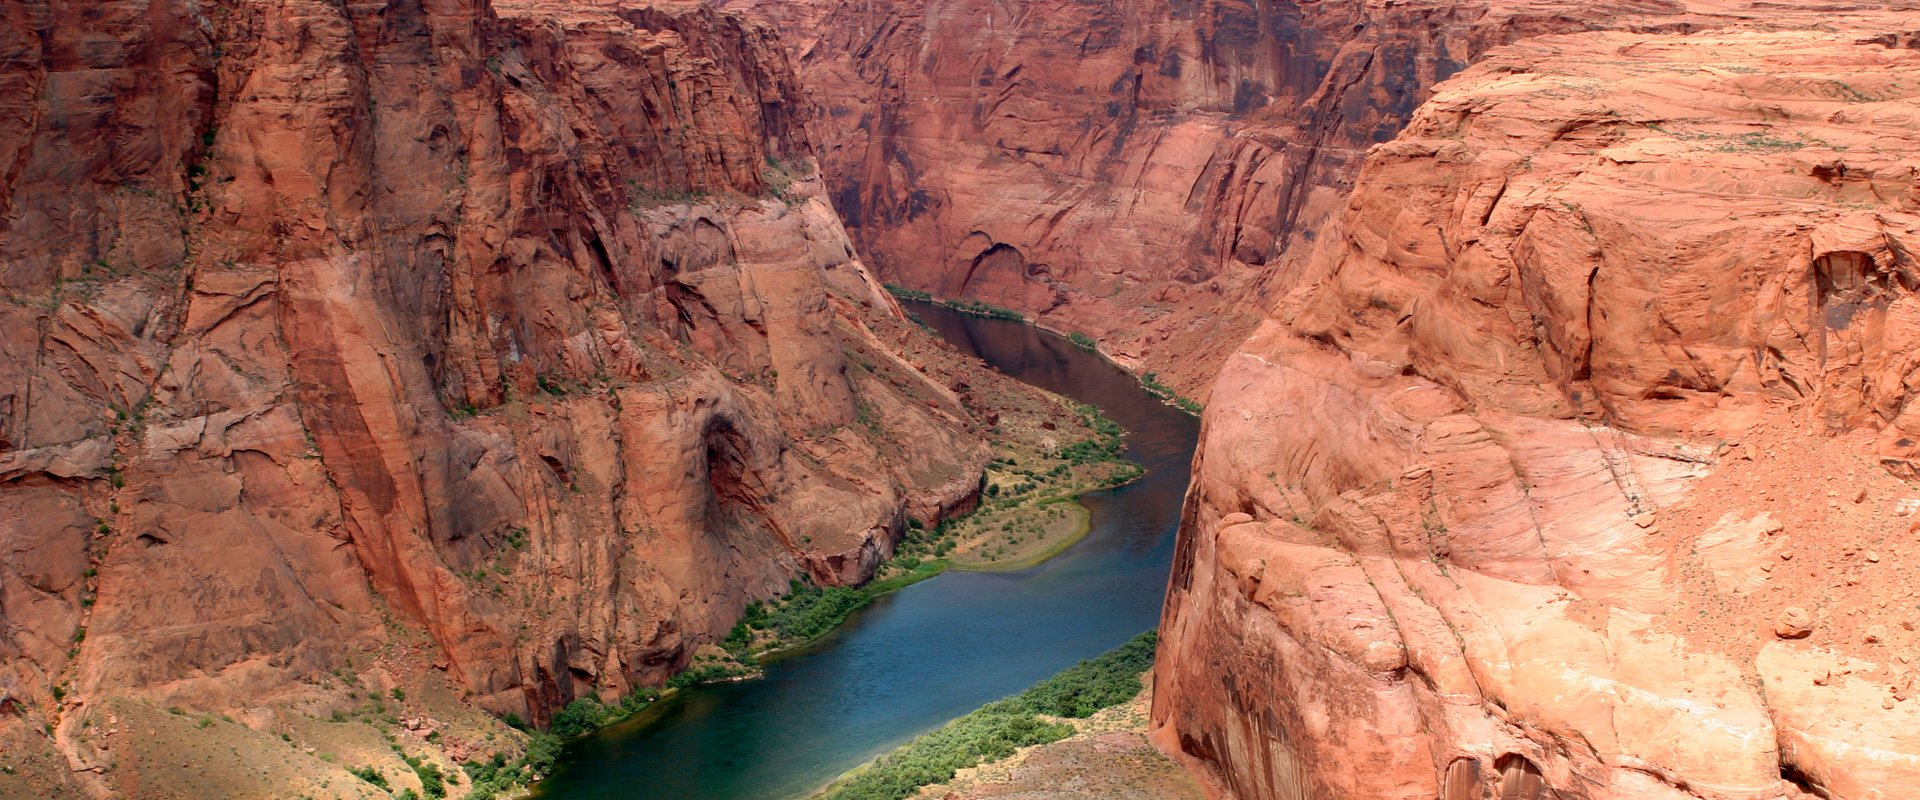 Тур на 4 дня по каньонам юго-запада Америки